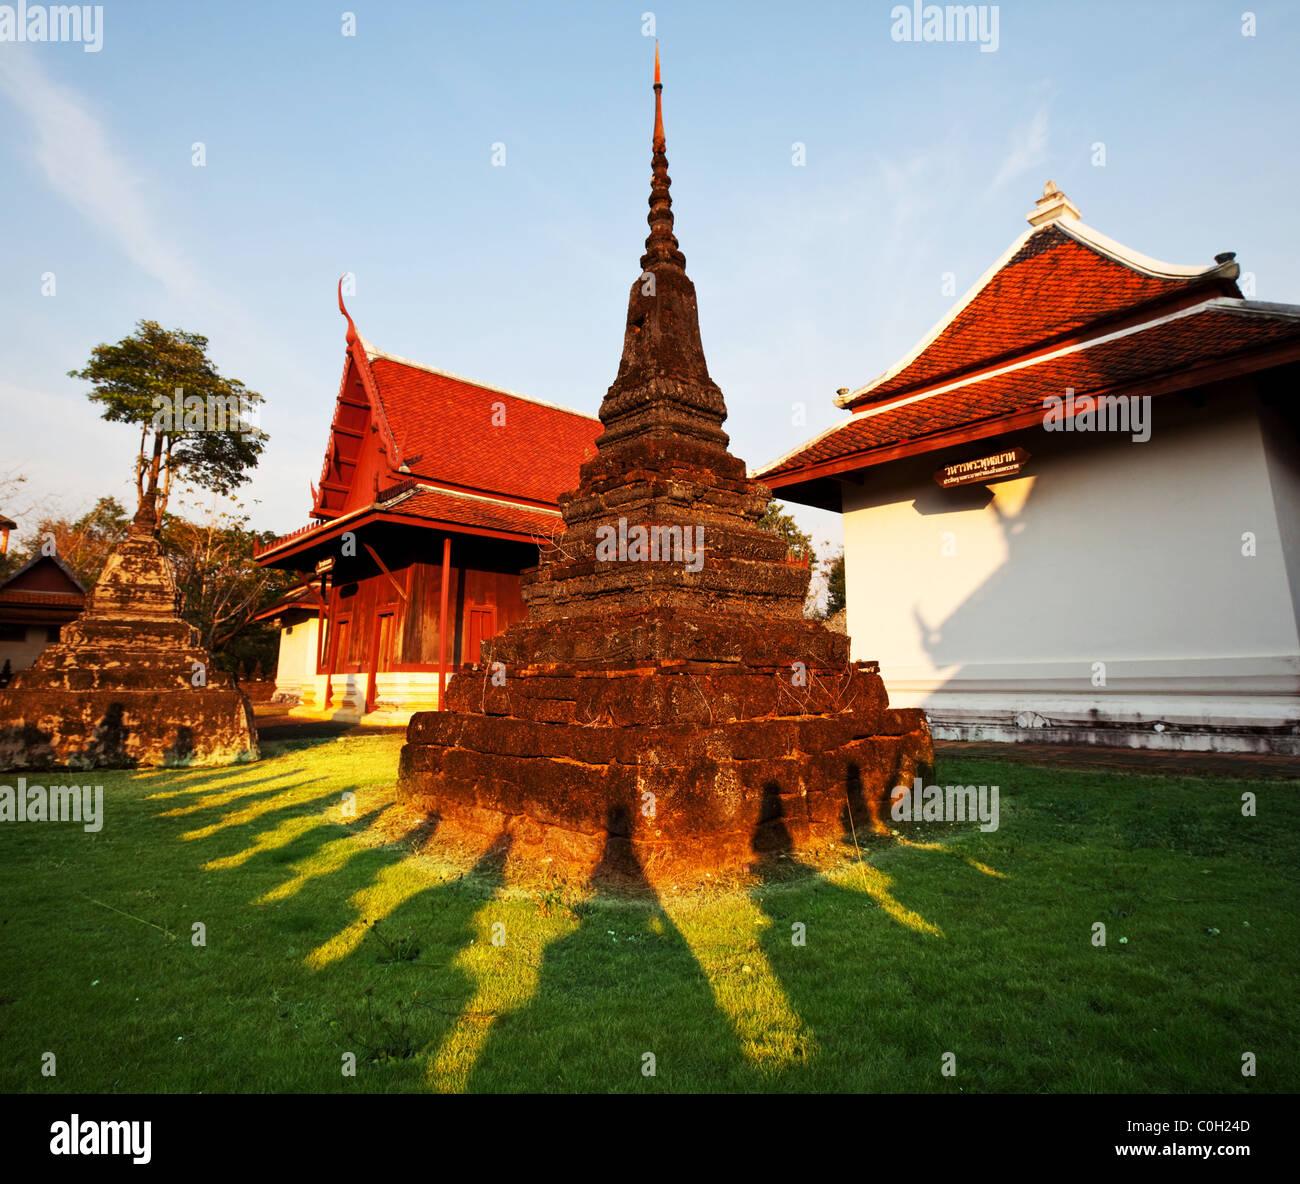 Tempel in Trat, Thailand Stockbild